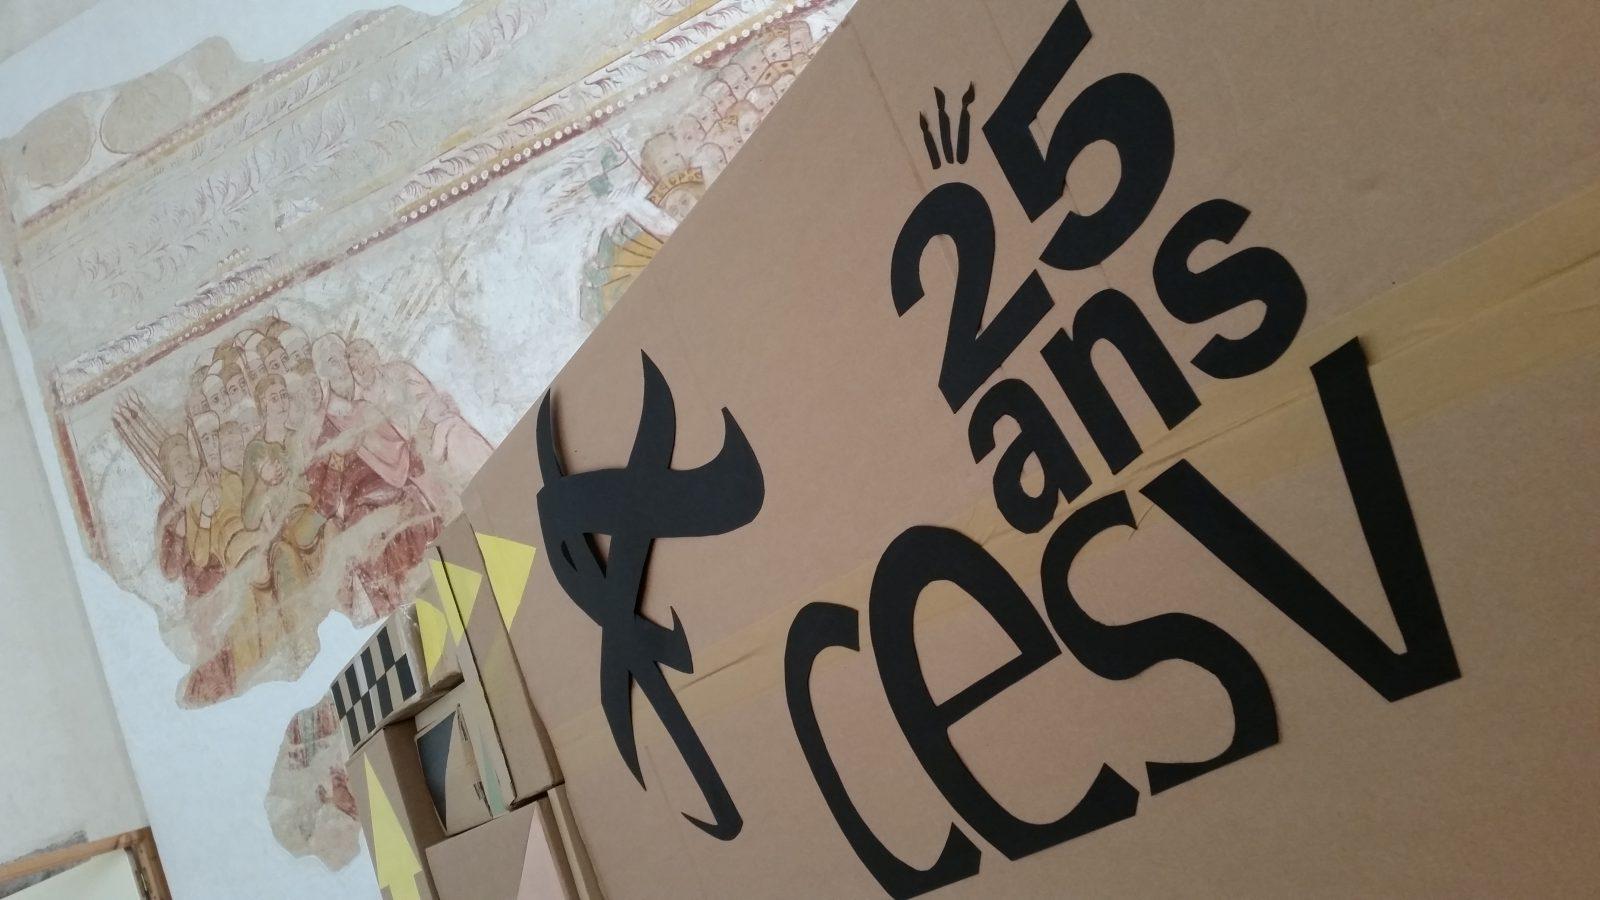 eduadecore-eventdesign-cesv25ans-abbayesaintsavin (25)